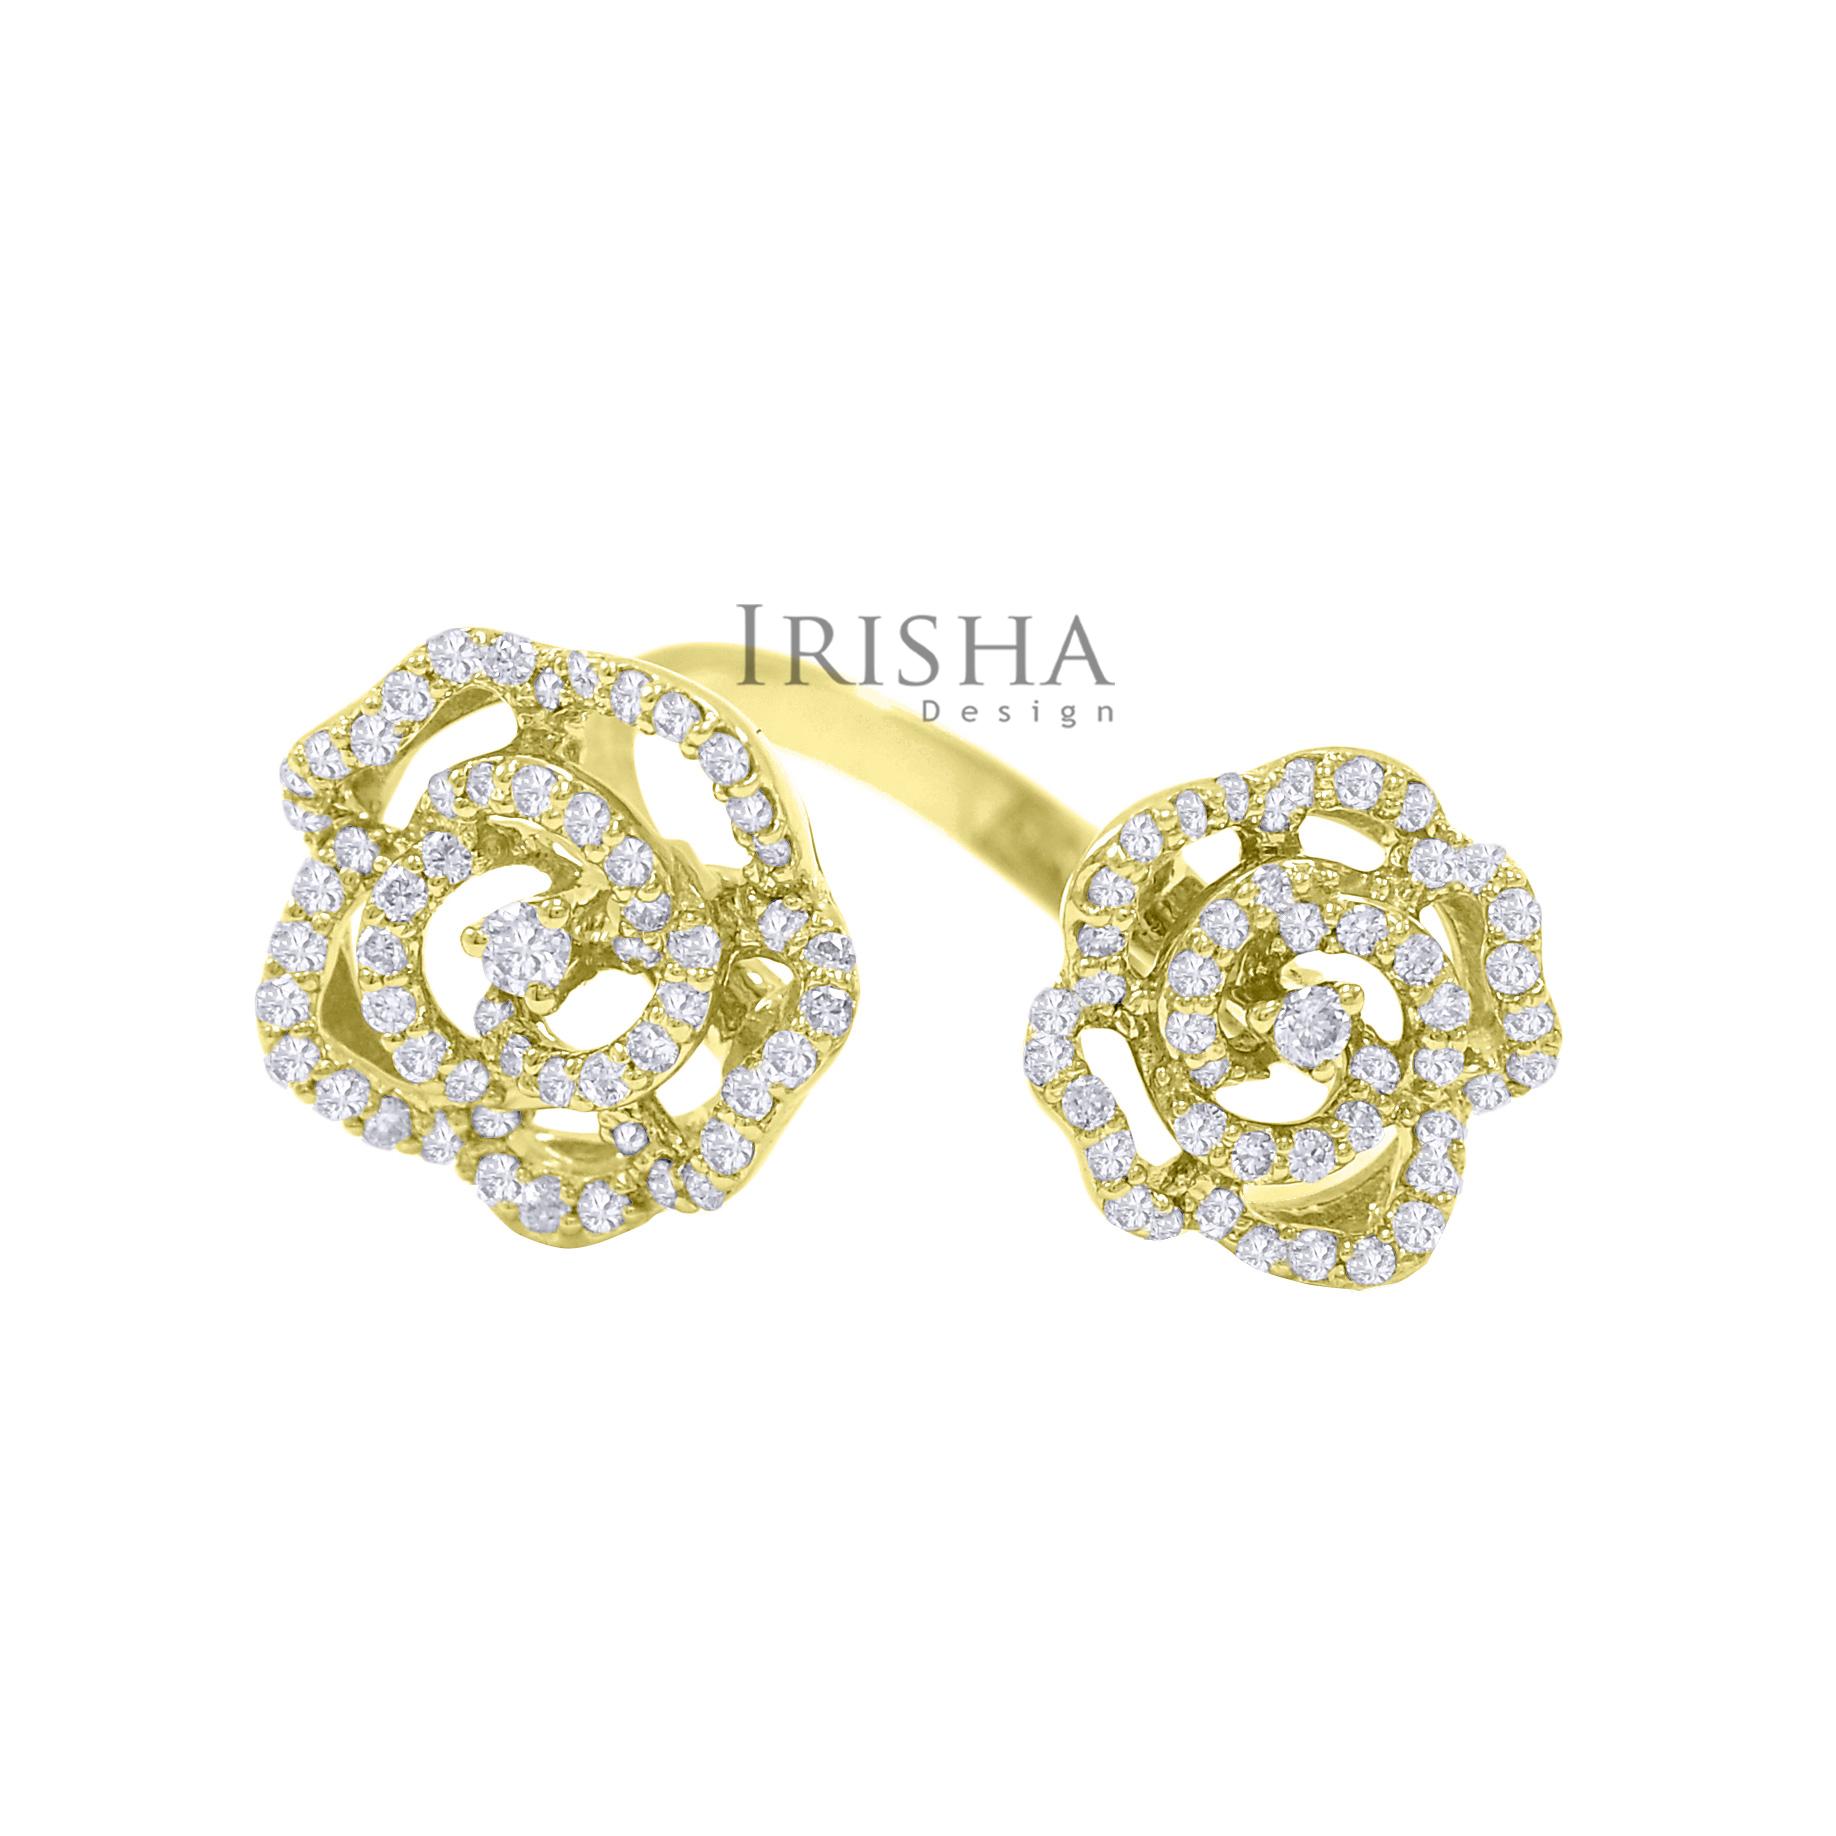 18K Gold 0.75 Ct. Genuine Diamonds Double Flower Open Cuff Ring Fine Jewelry